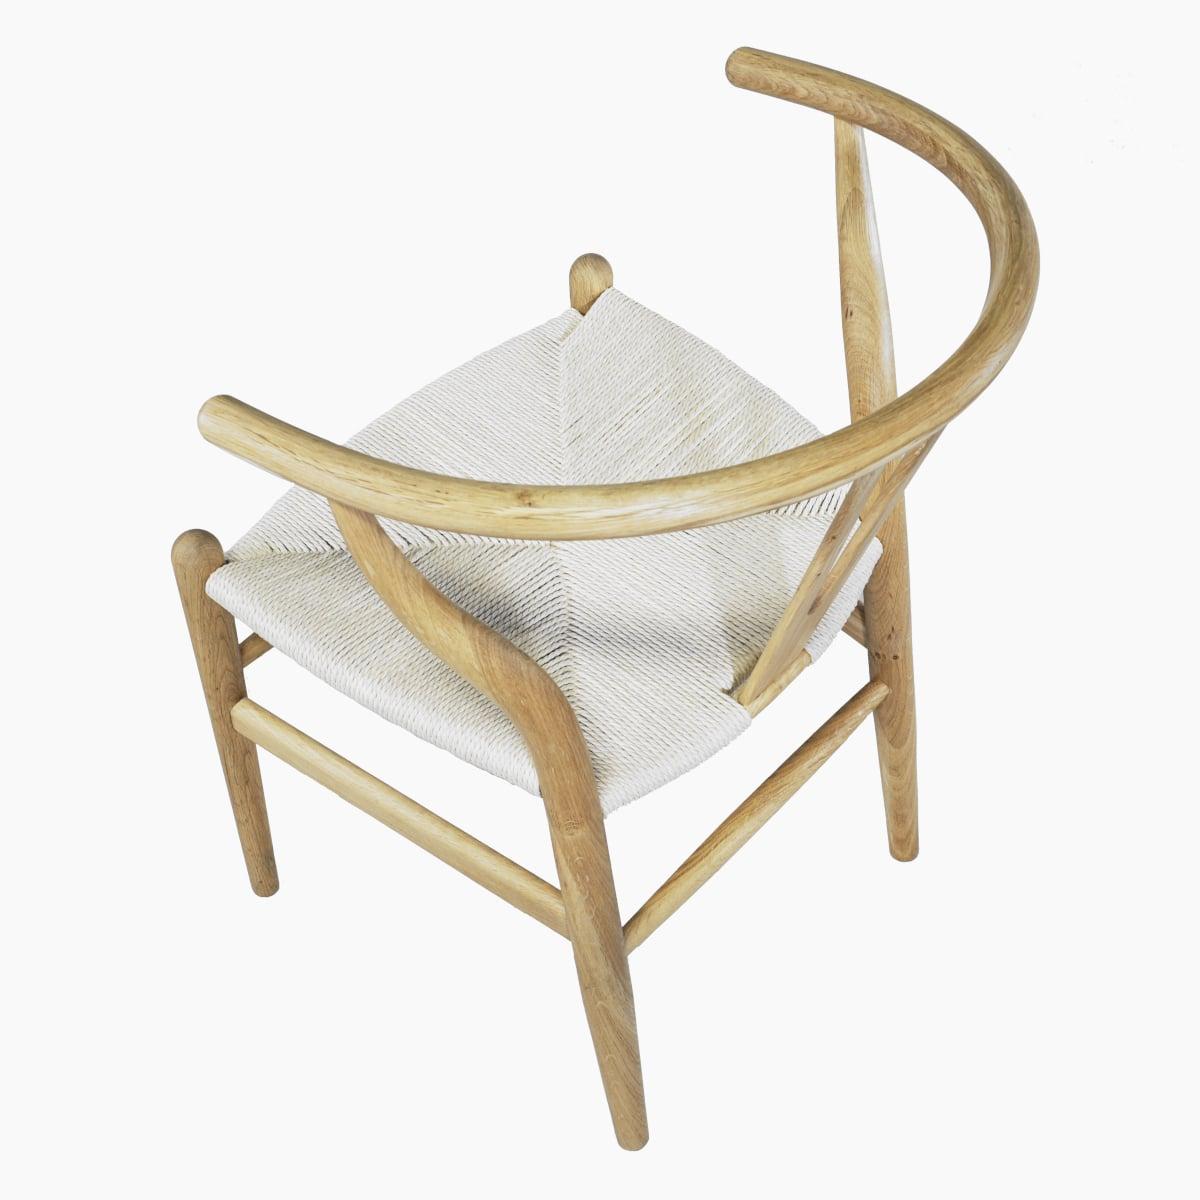 Eichenholz Armlehstuhl ähnlich Wegner Stuhl